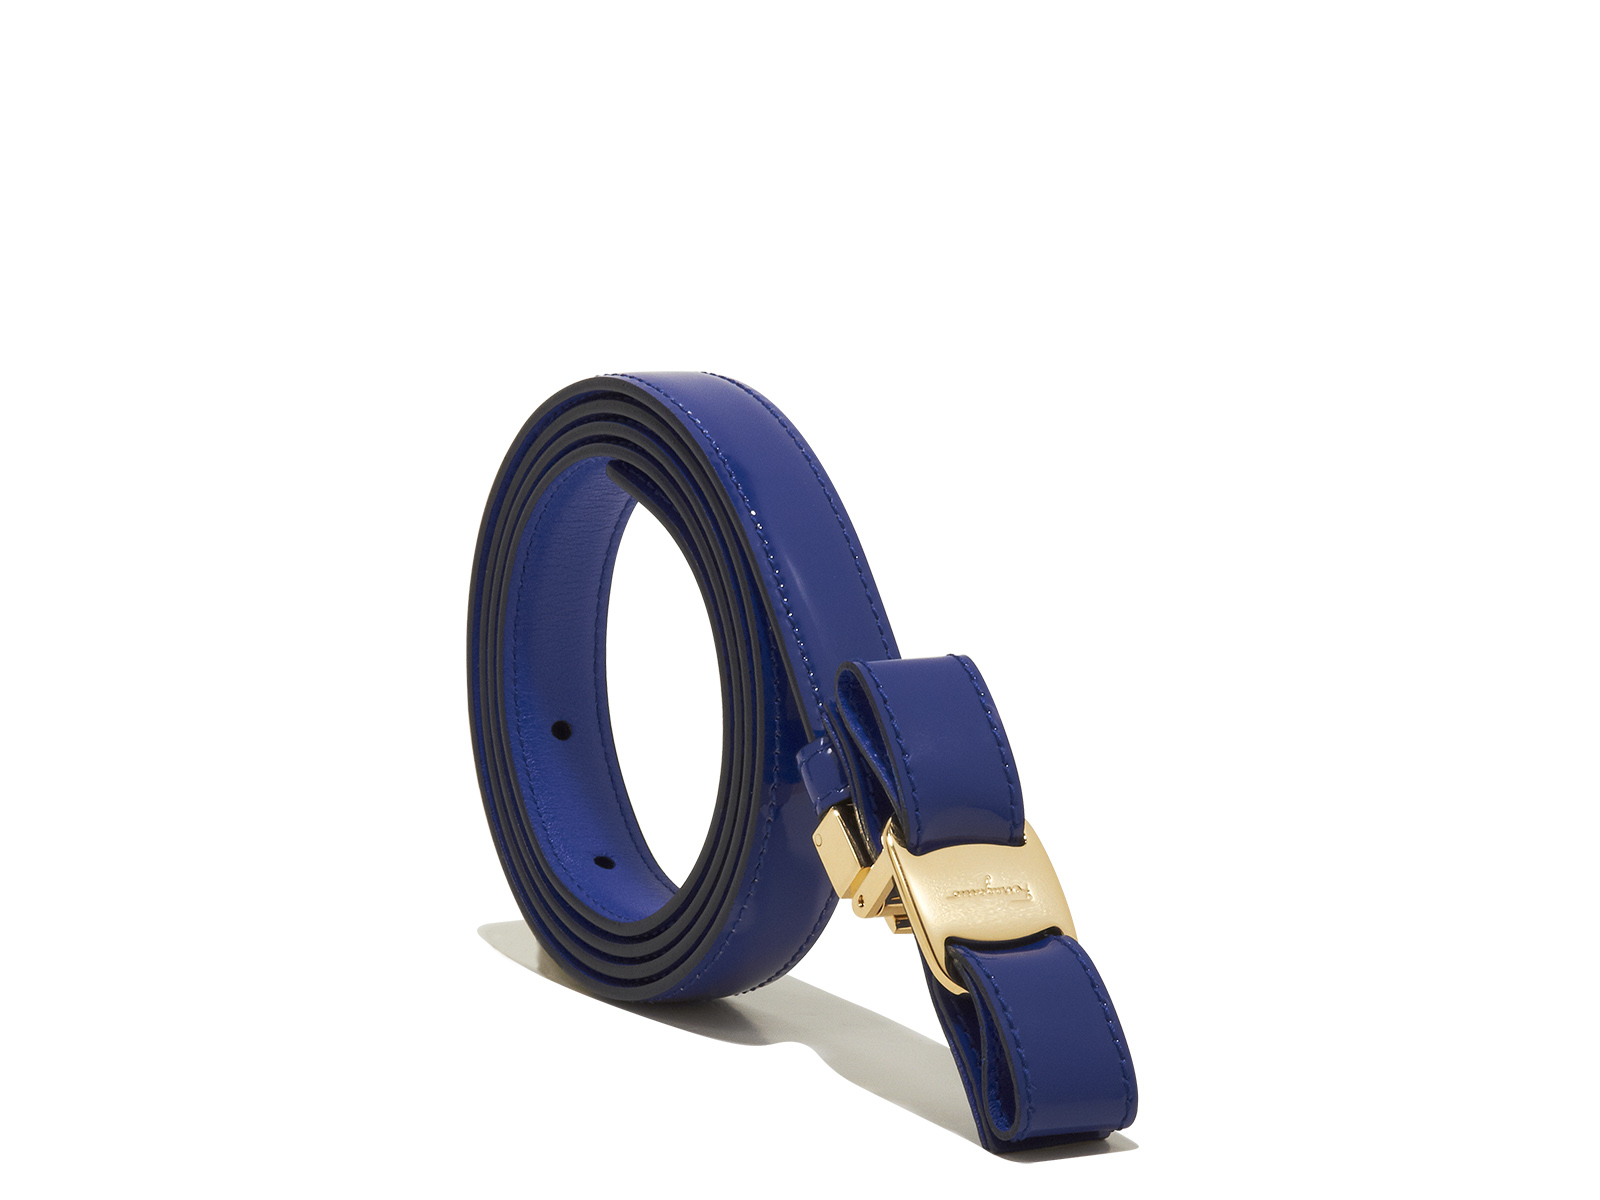 Ferragamo Vara Bow Belt in Blue (Bright Blue) - Lyst